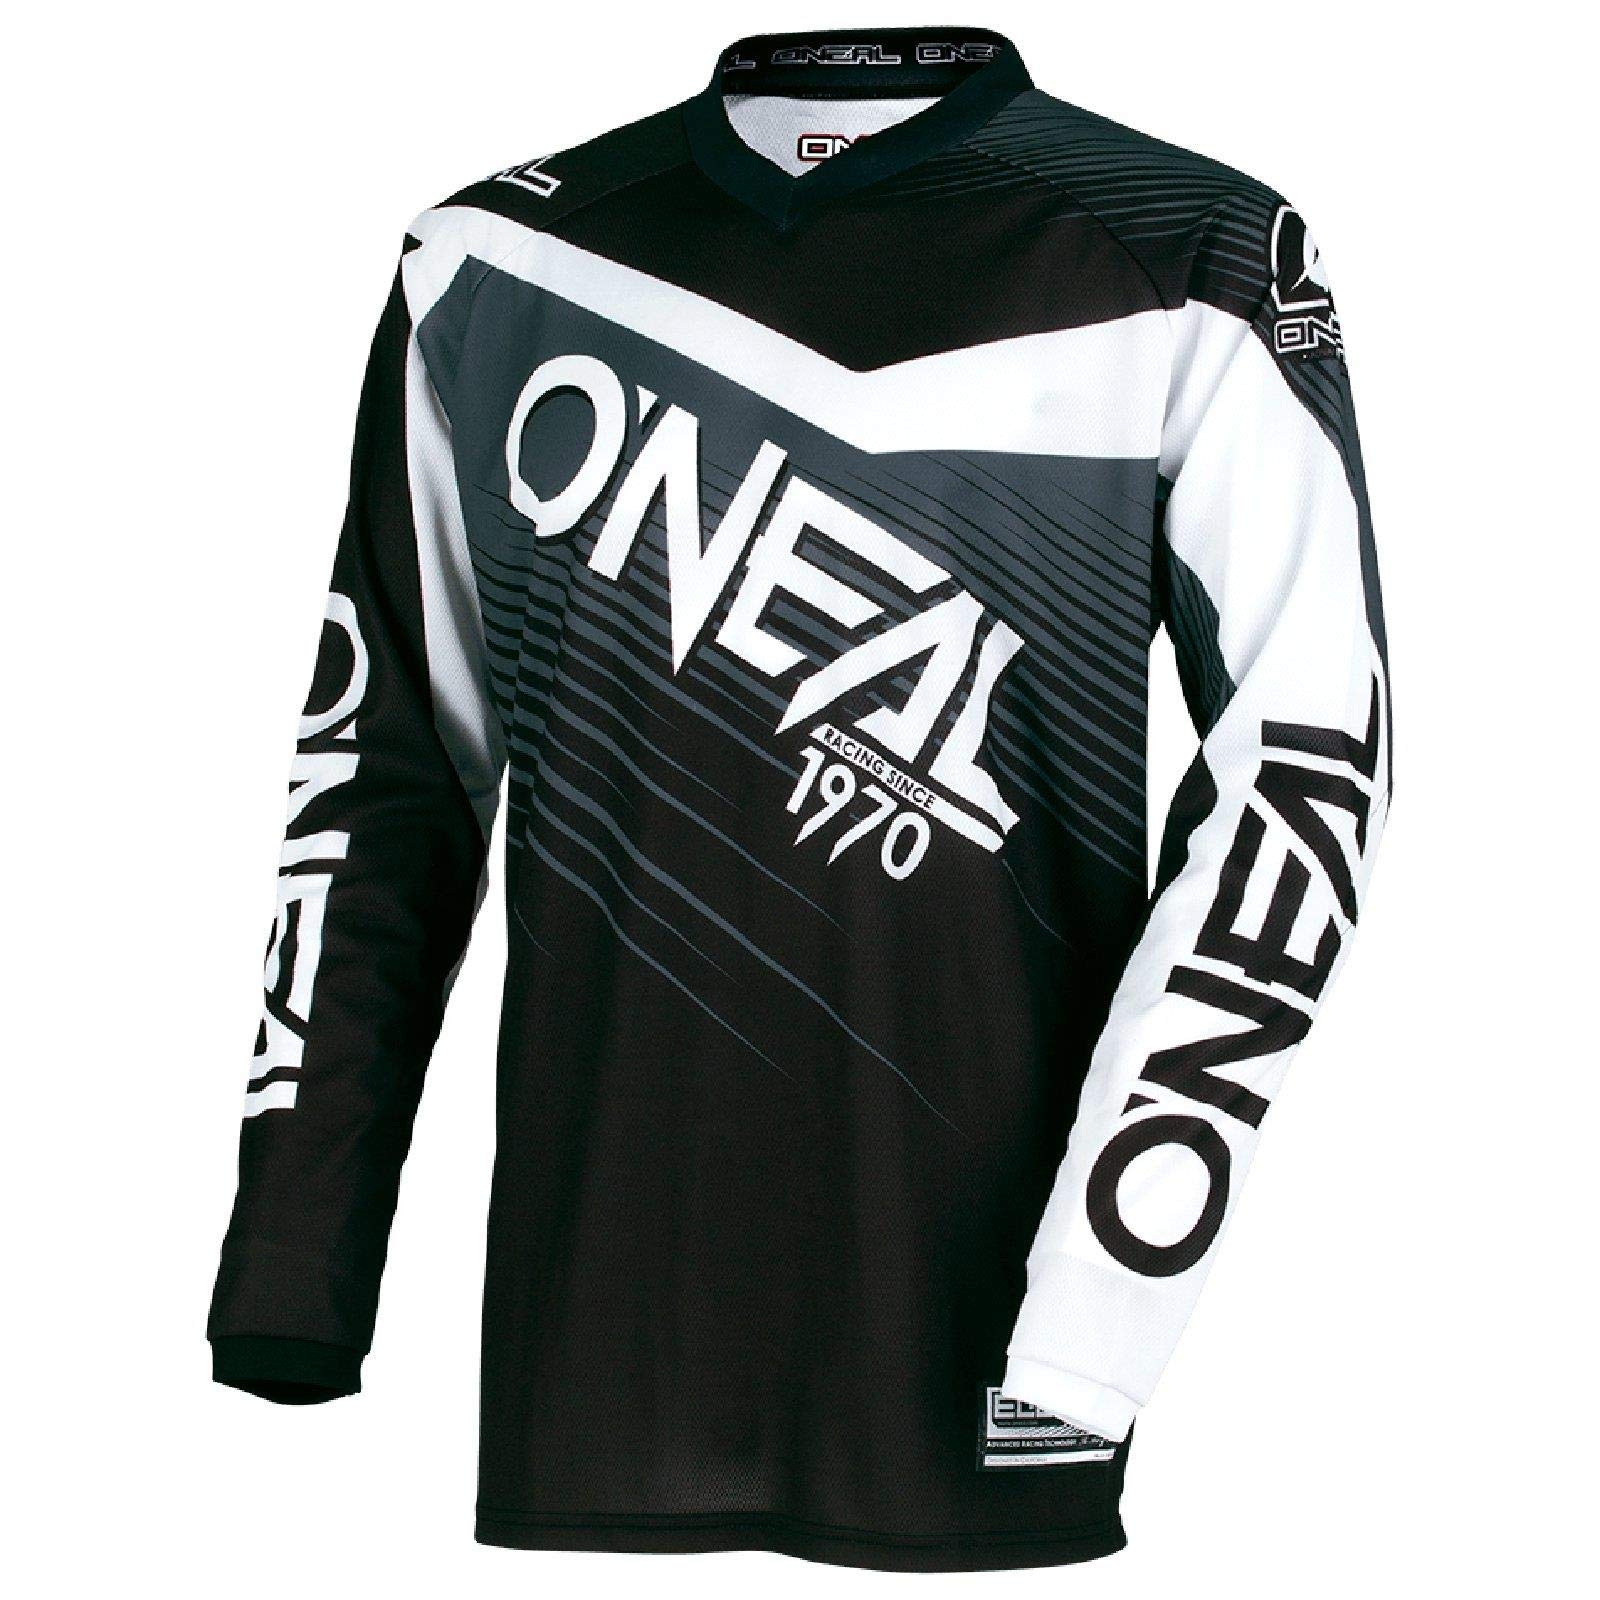 Oneal Element 2018 Racewear Motocross Jersey 4XL Black Gray 0008-108